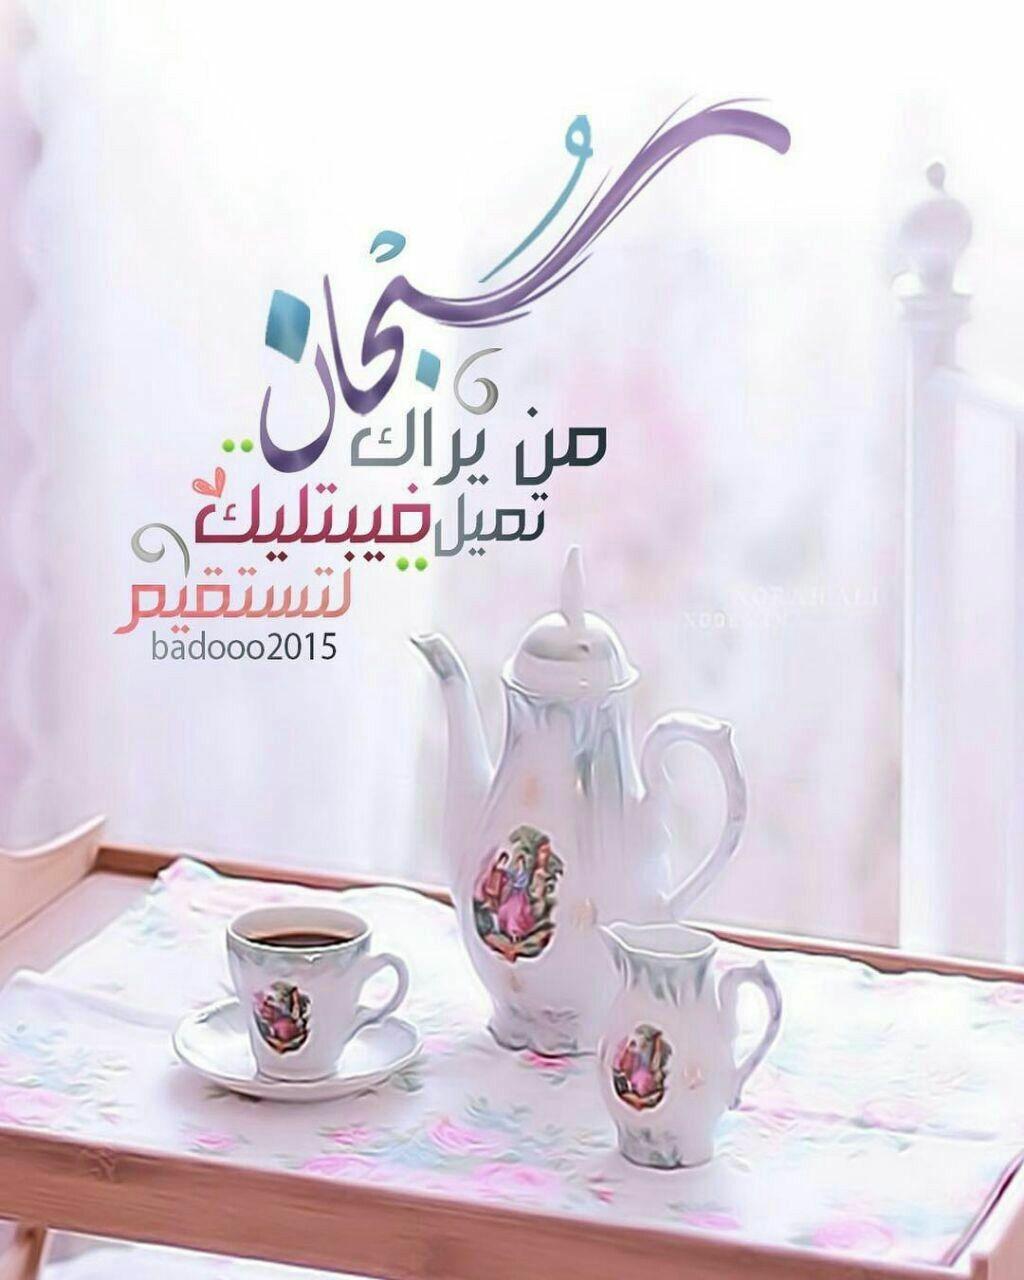 Pin By رحمة عبد الهادي On أجيب دعوة الداعي Glassware Tableware Teaching